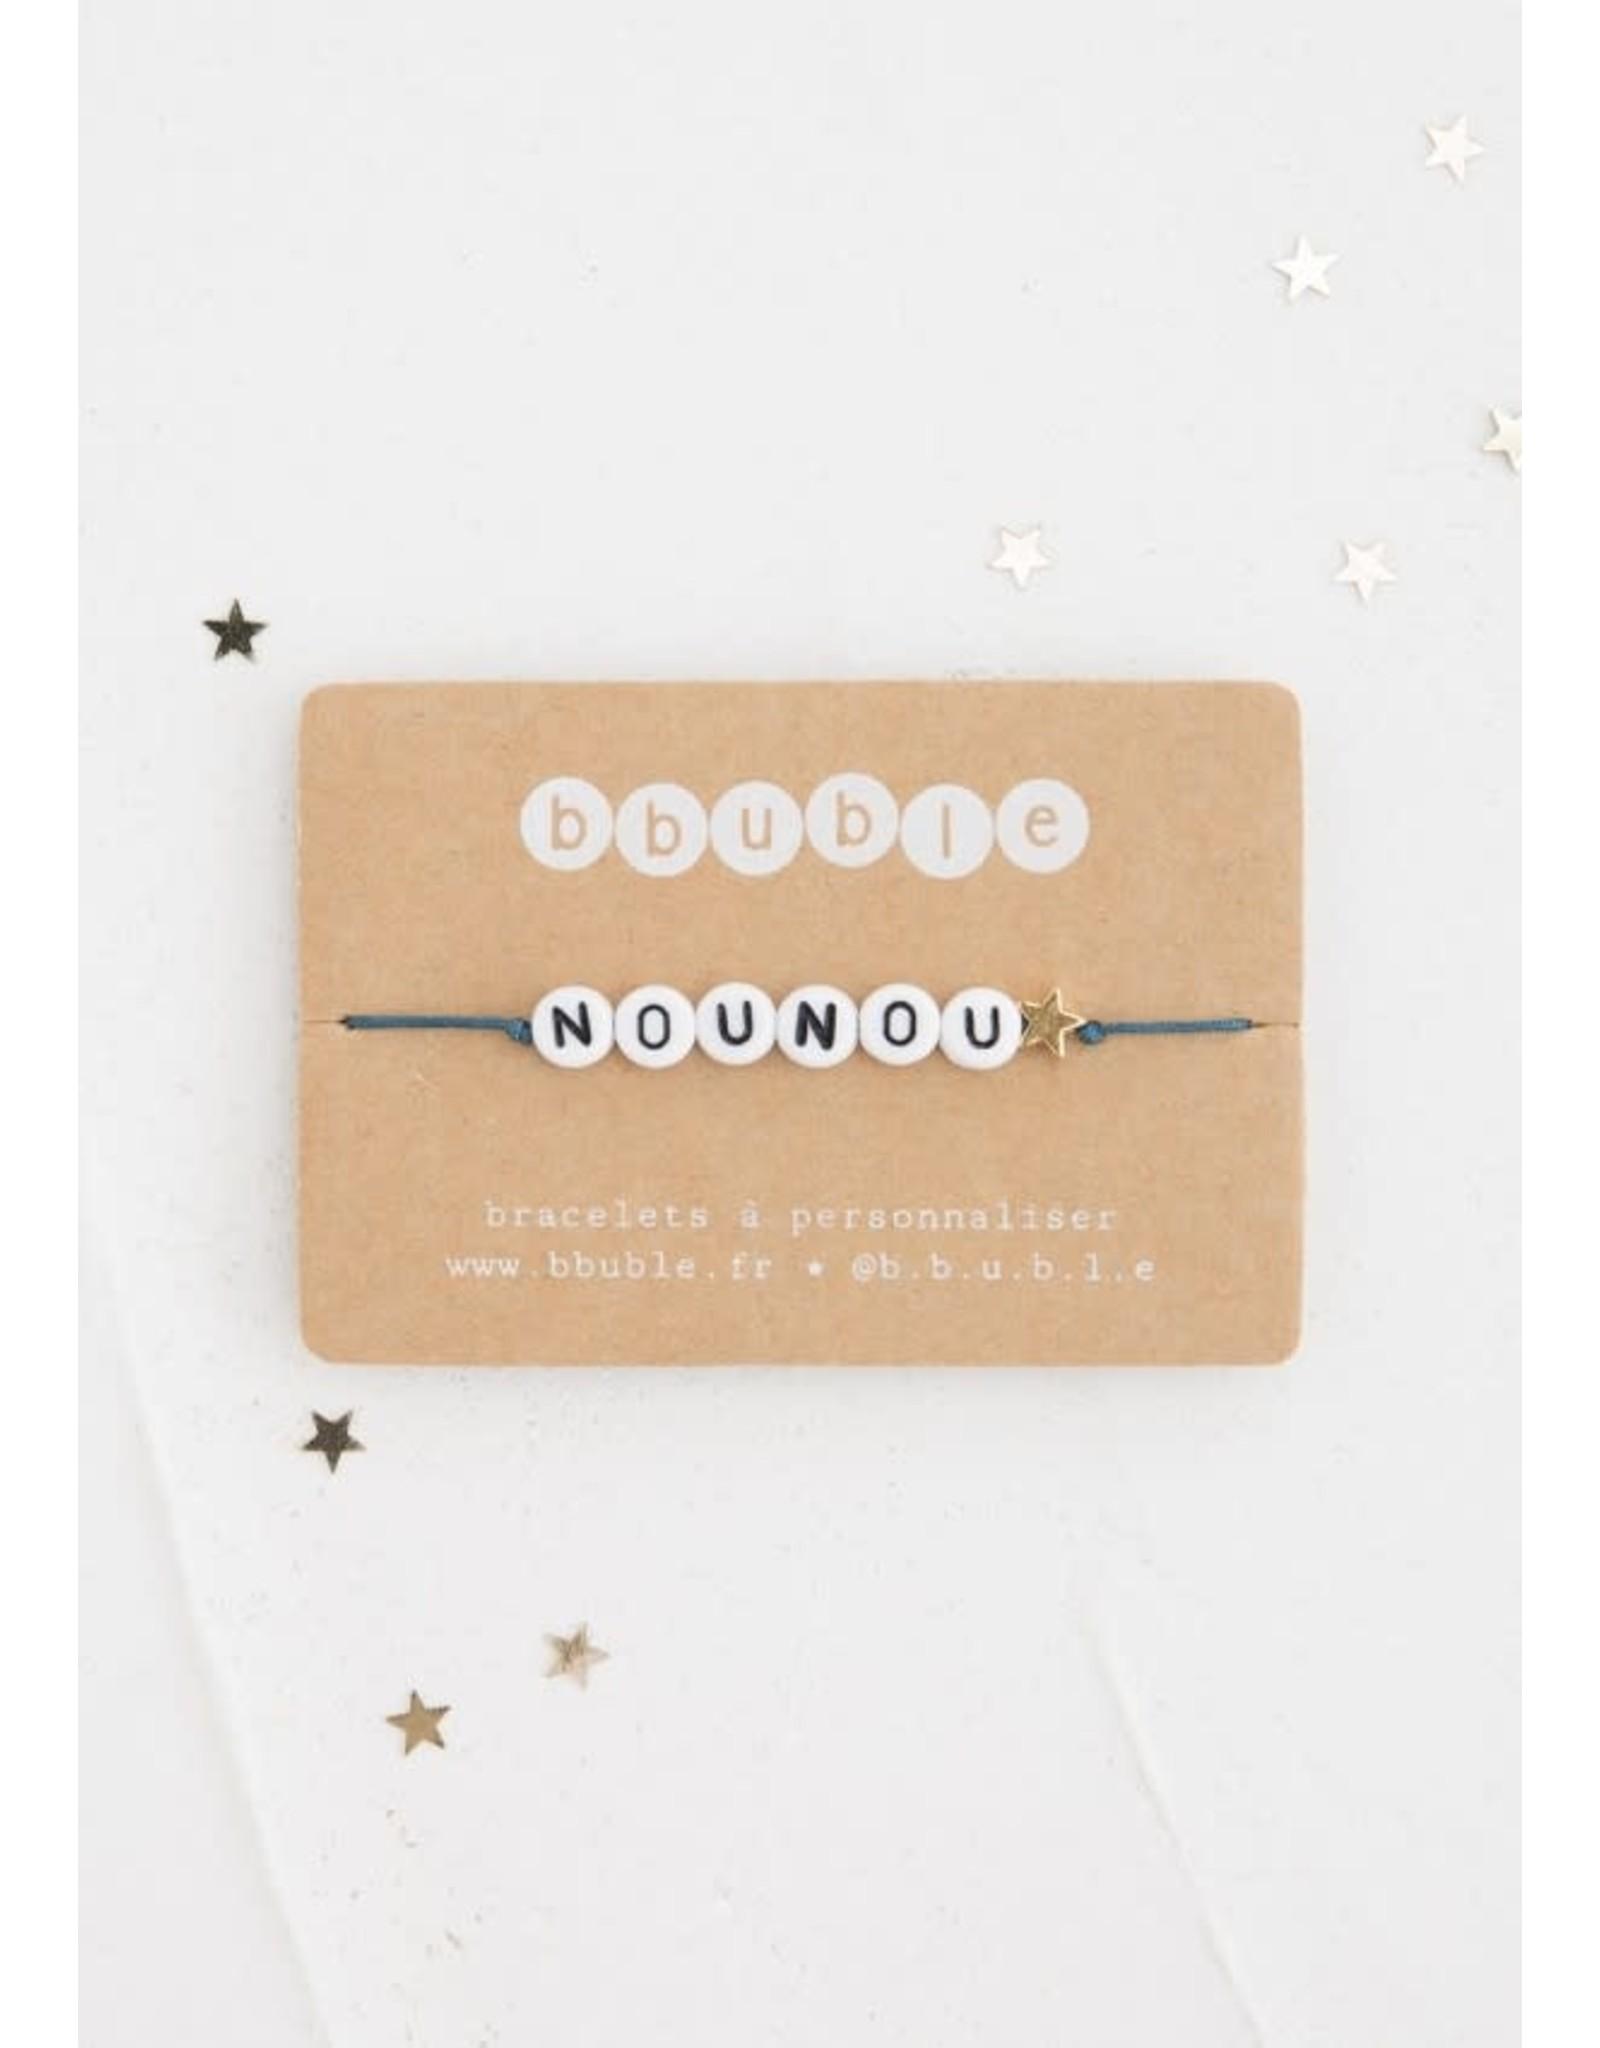 Bbubble Bracelet / blanc / Nounou + (étoile)